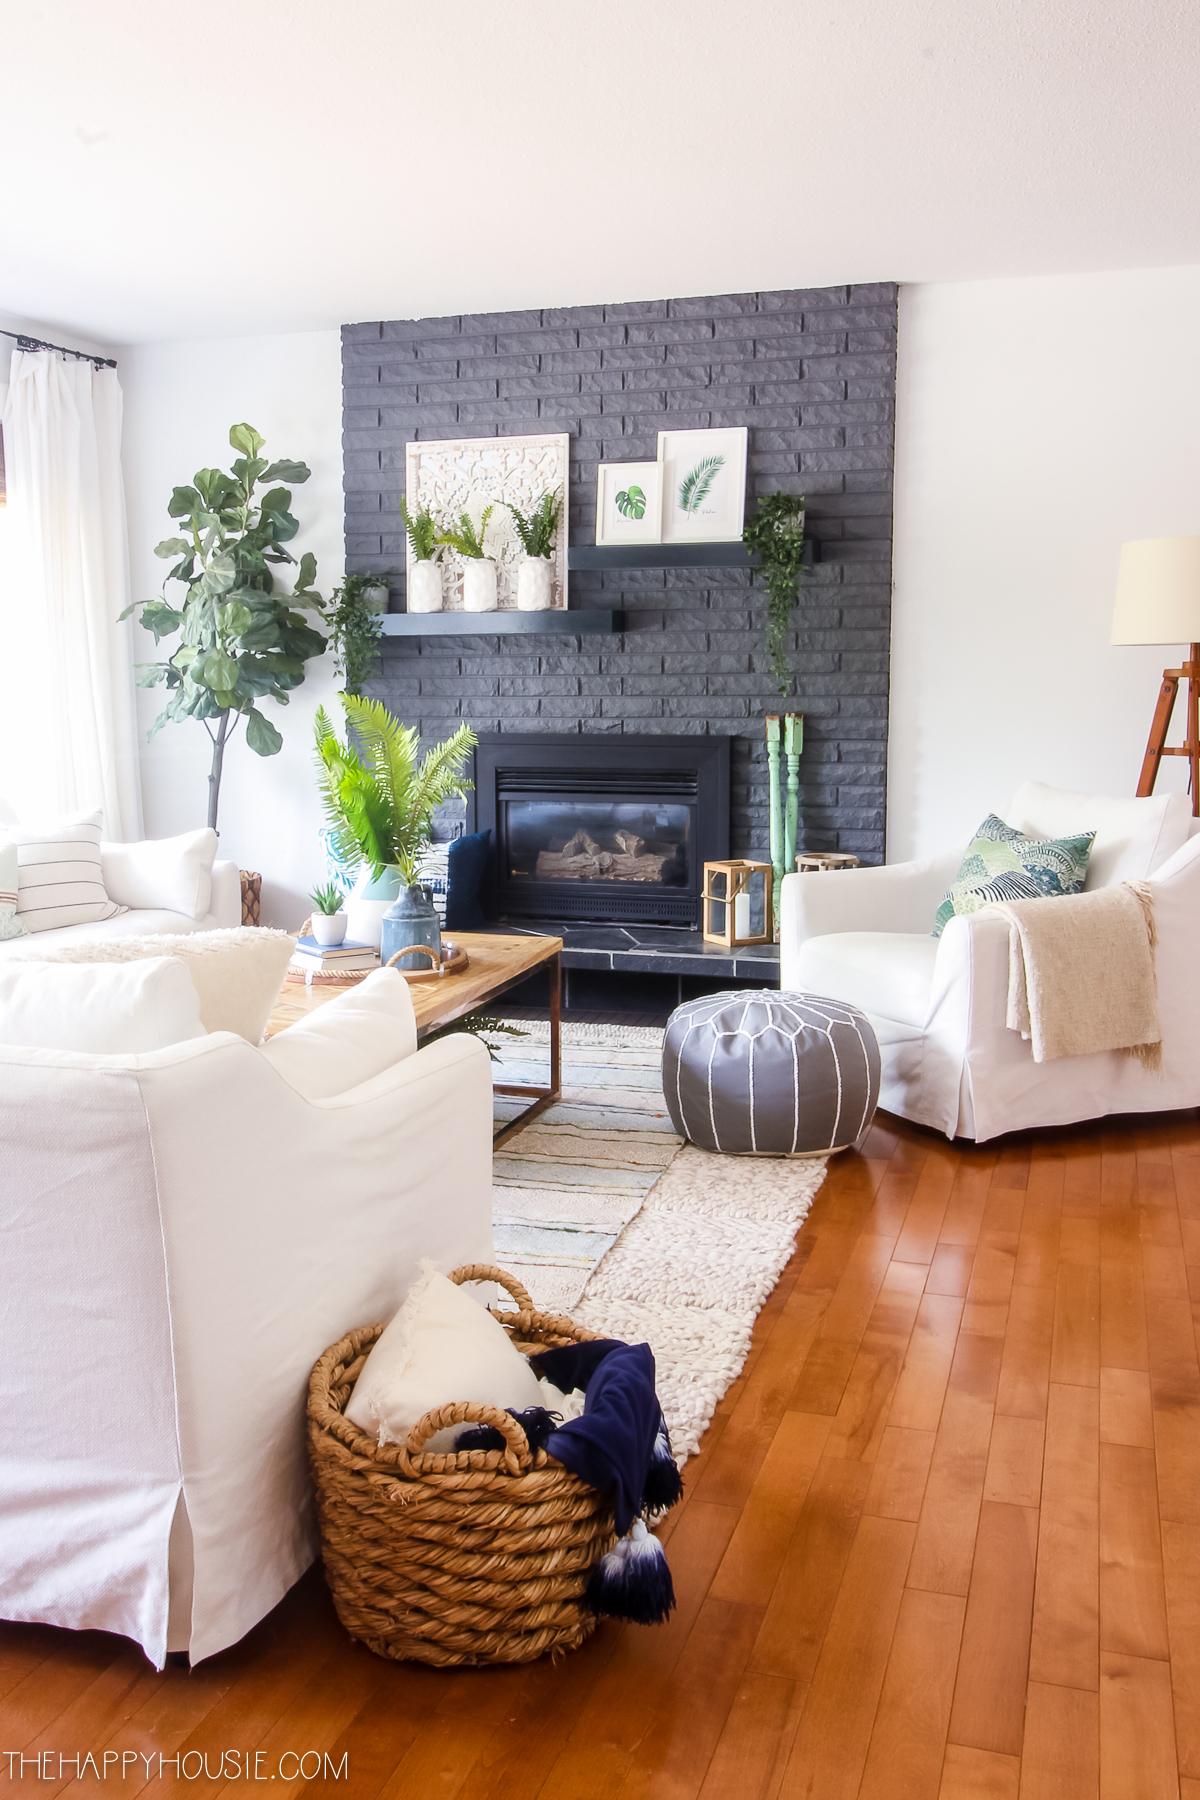 Modern Boho Farmhouse Style Simple Summer Home Tour | The ... on Modern Boho Decor  id=99905